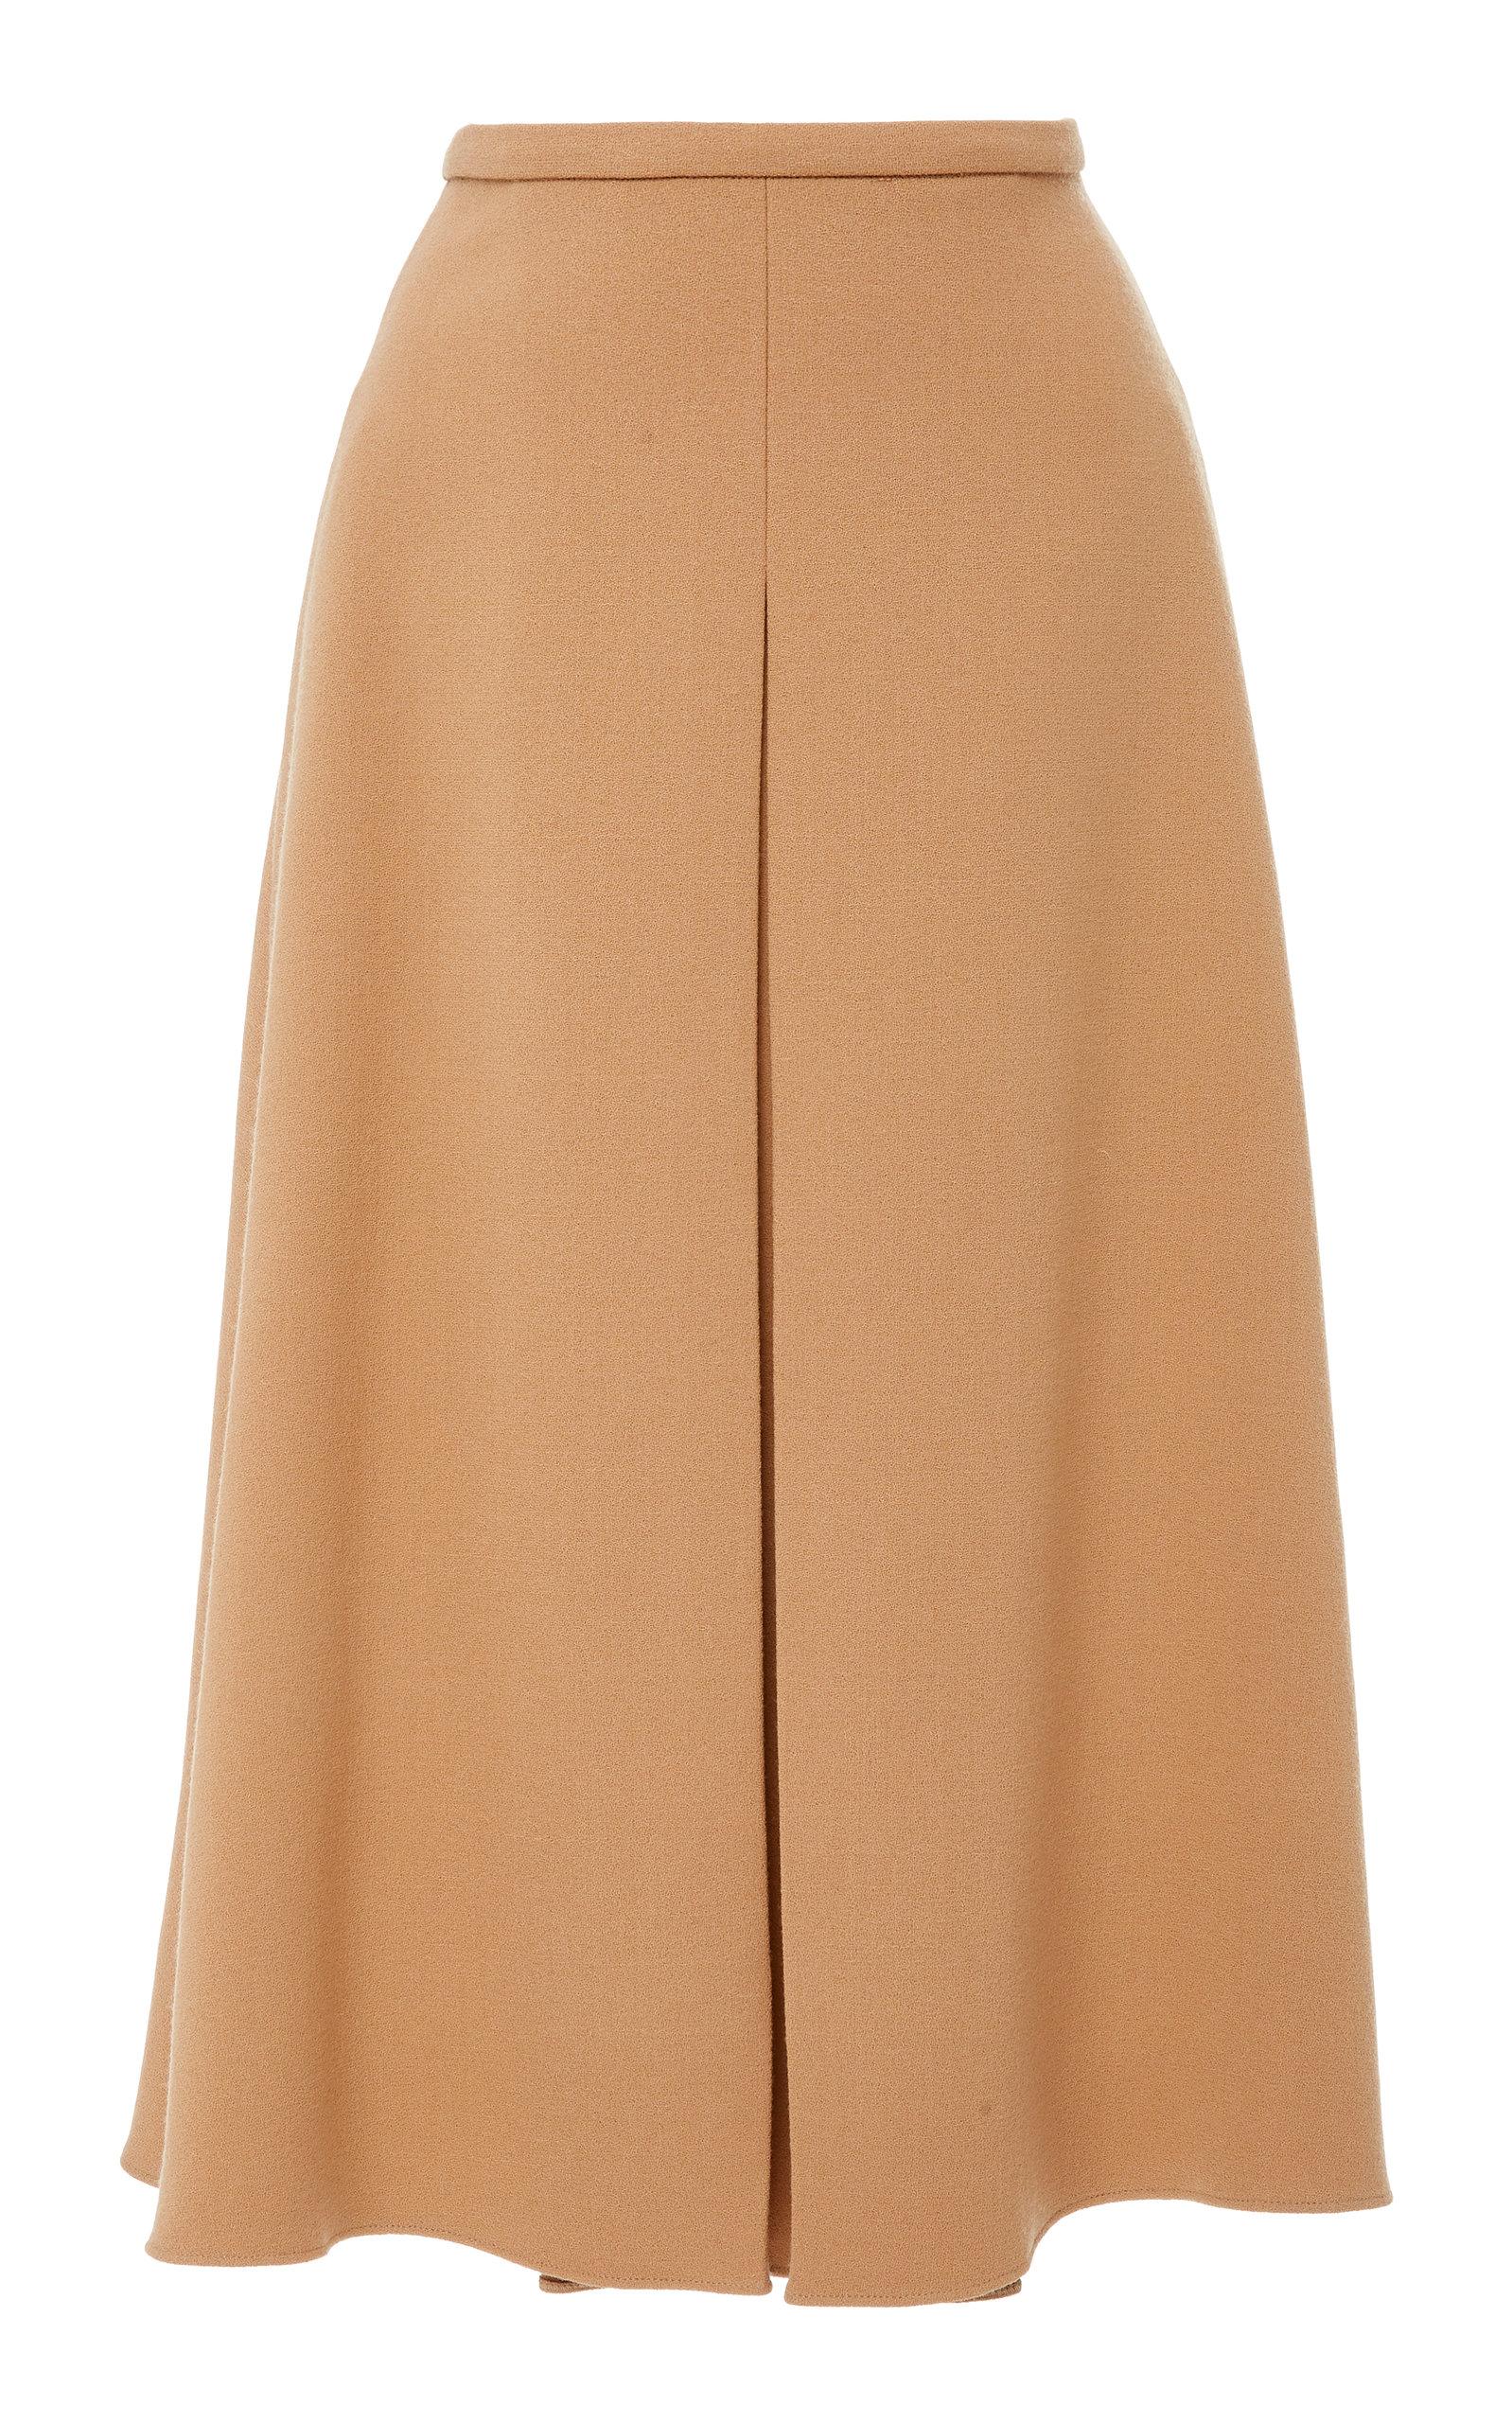 ROCHAS A-Line Wool And Silk-Blend Midi Skirt in Neutrals